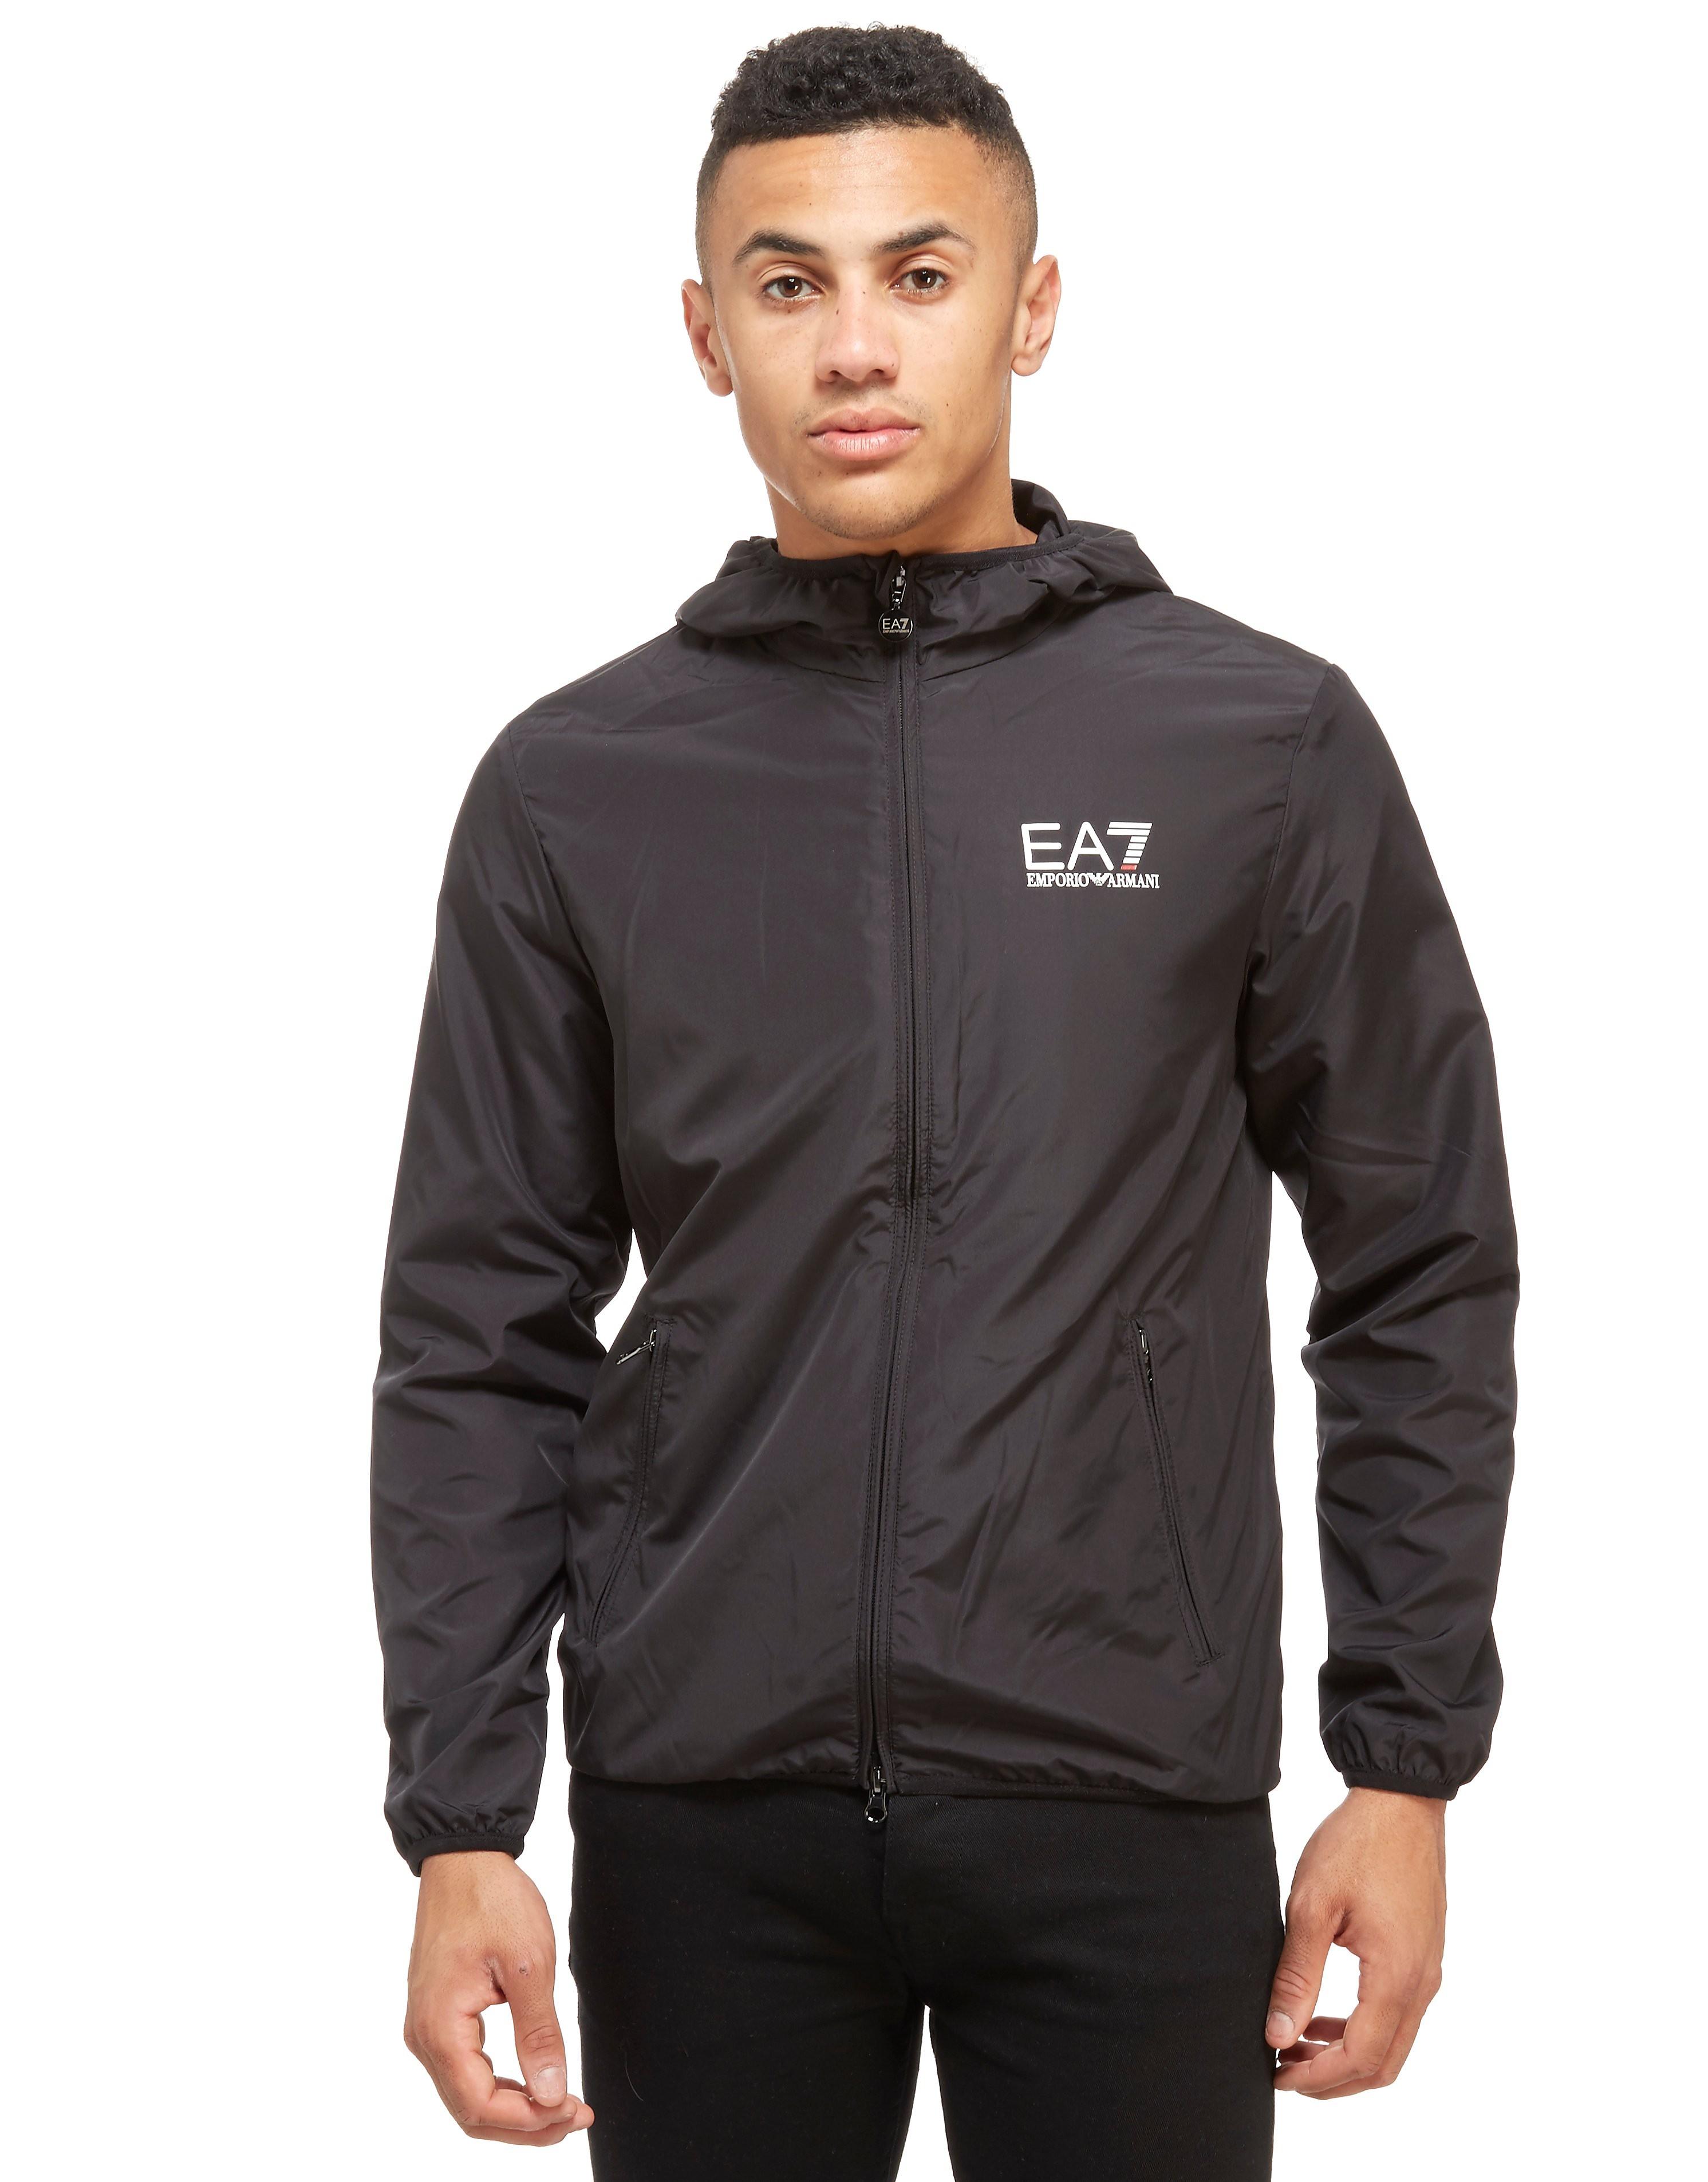 Emporio Armani EA7 Core Lightweight Hooded Jacket